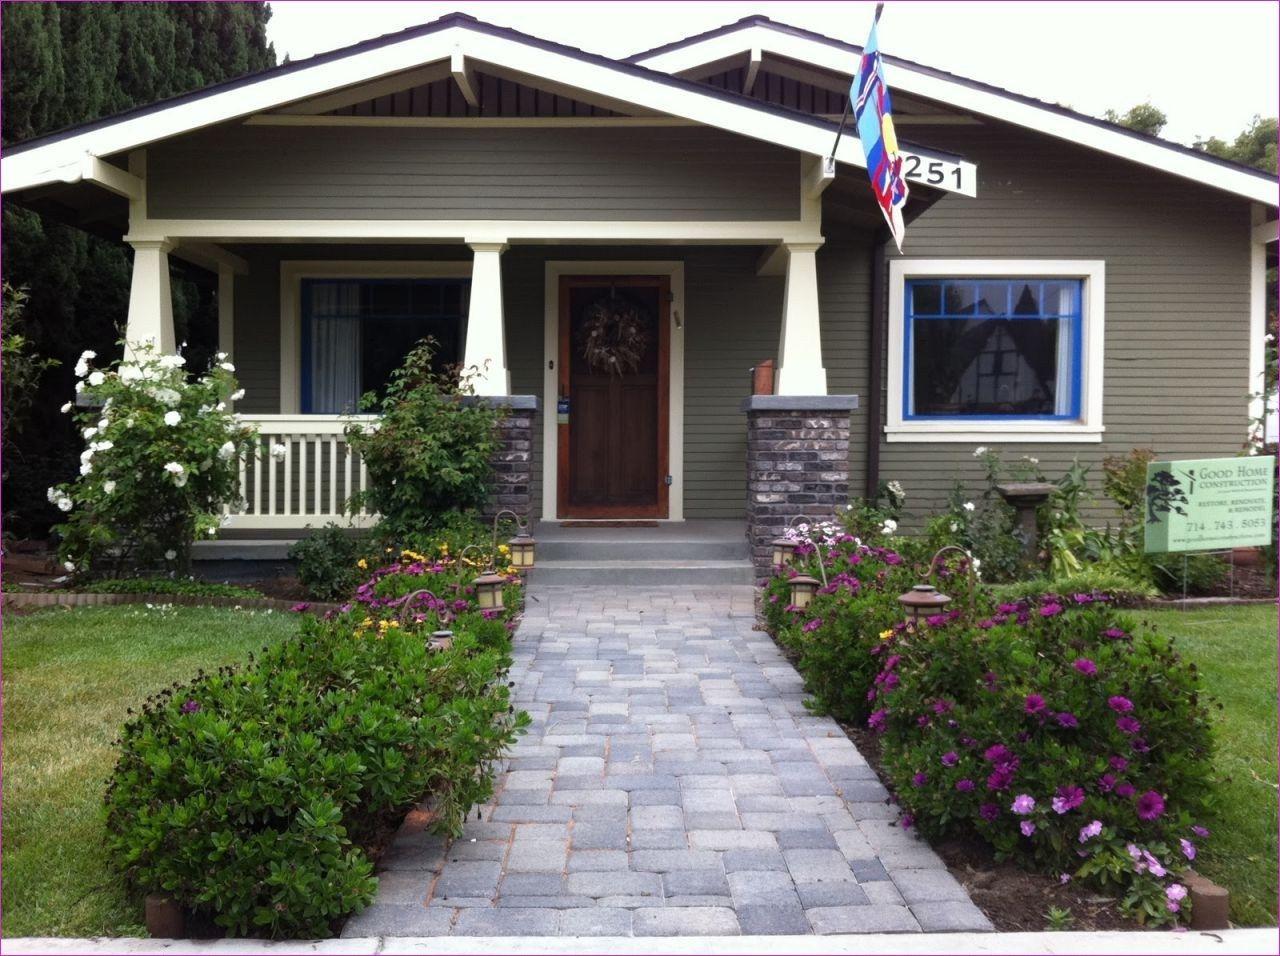 41 Awesome Brick Front Porch Decor Ideas Truehome House Front Porch Craftsman Front Porches Bungalow Porch